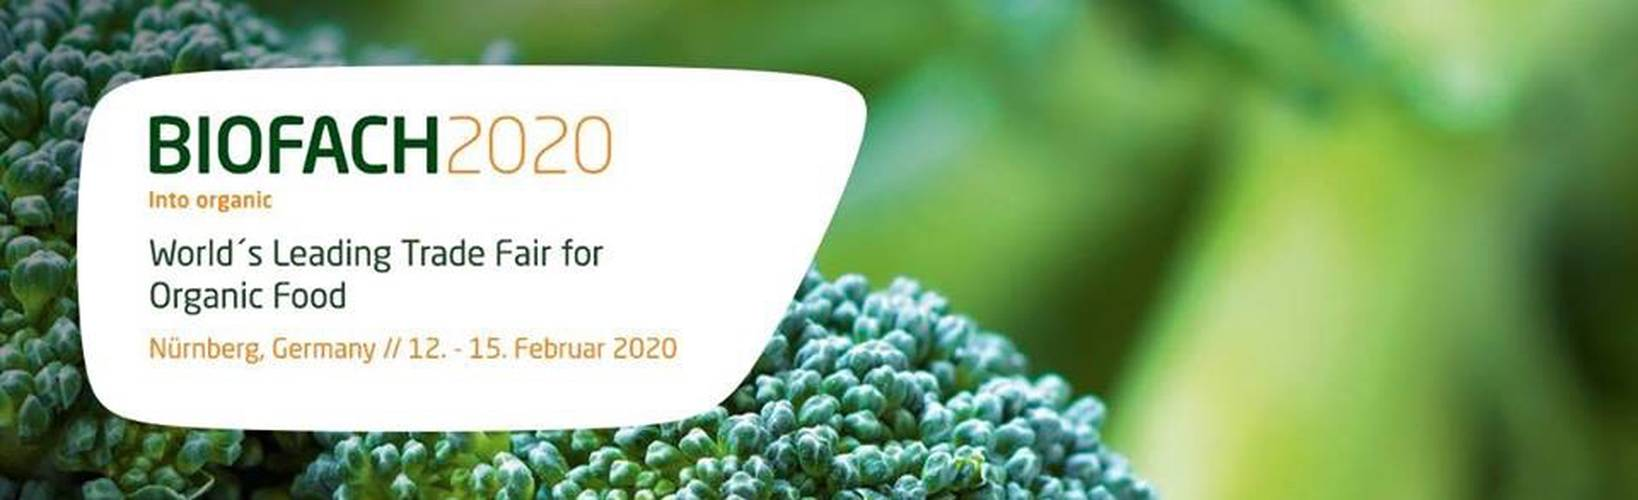 Exposer-a-BIOFACH-2020